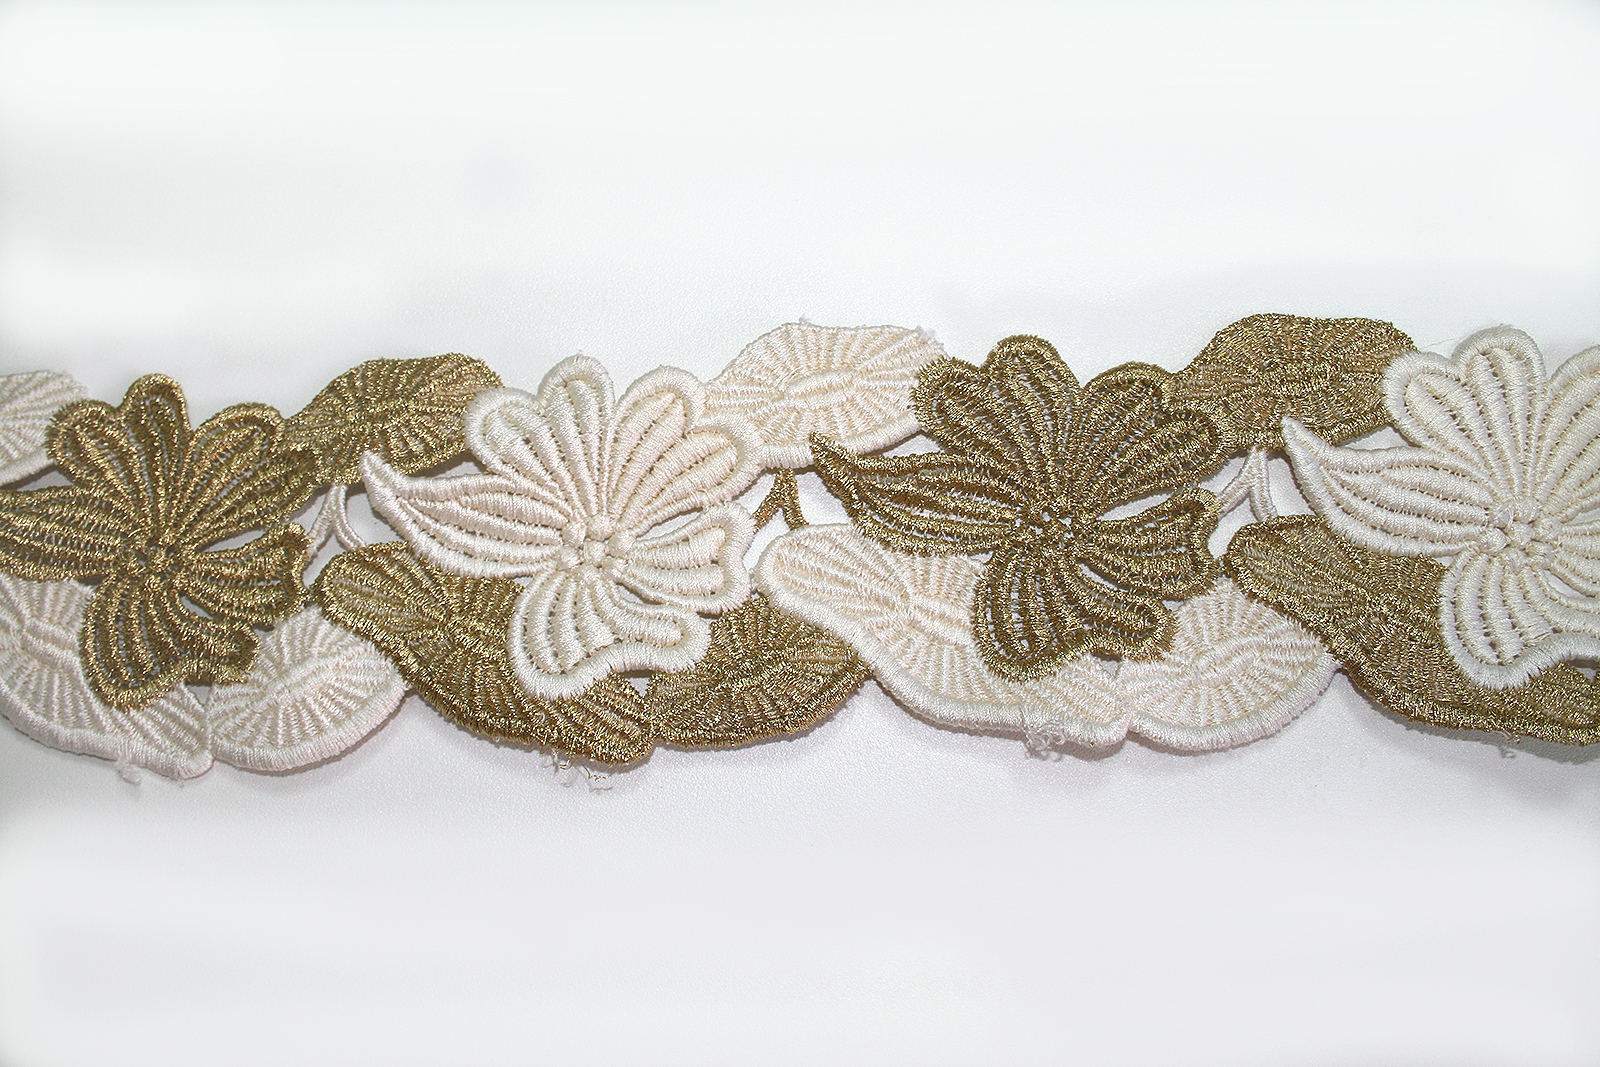 White Cream Metallic Gold Bridal Border Trim Embroidery Scallop Edging Bustier Vail Hem Belt ...